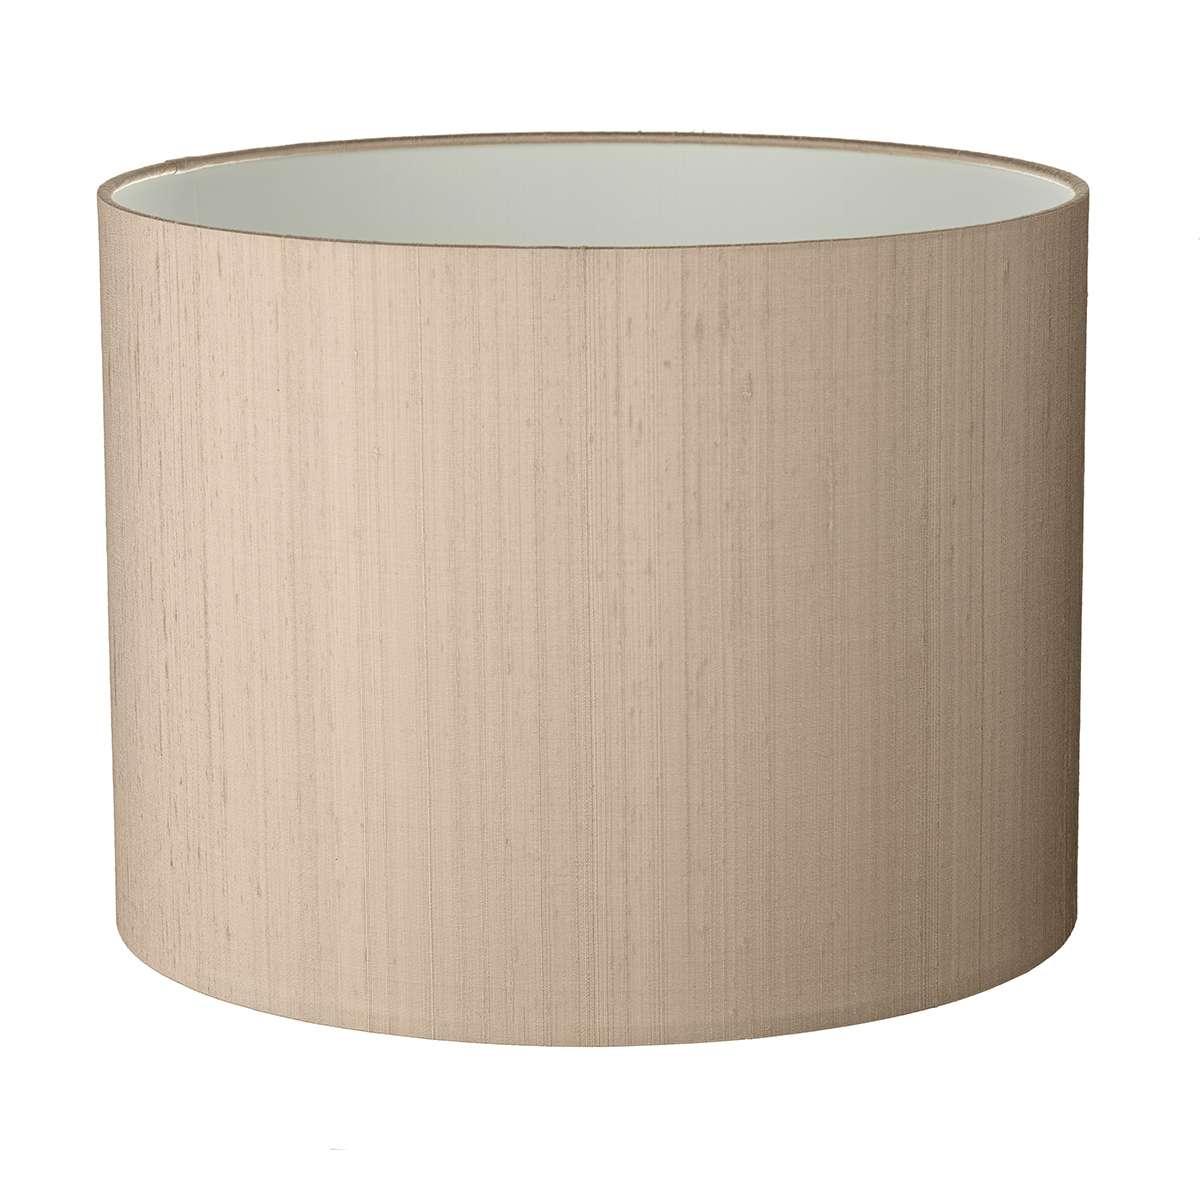 Drum Medium 20CM 100% Silk Shade with Shade Colour Options